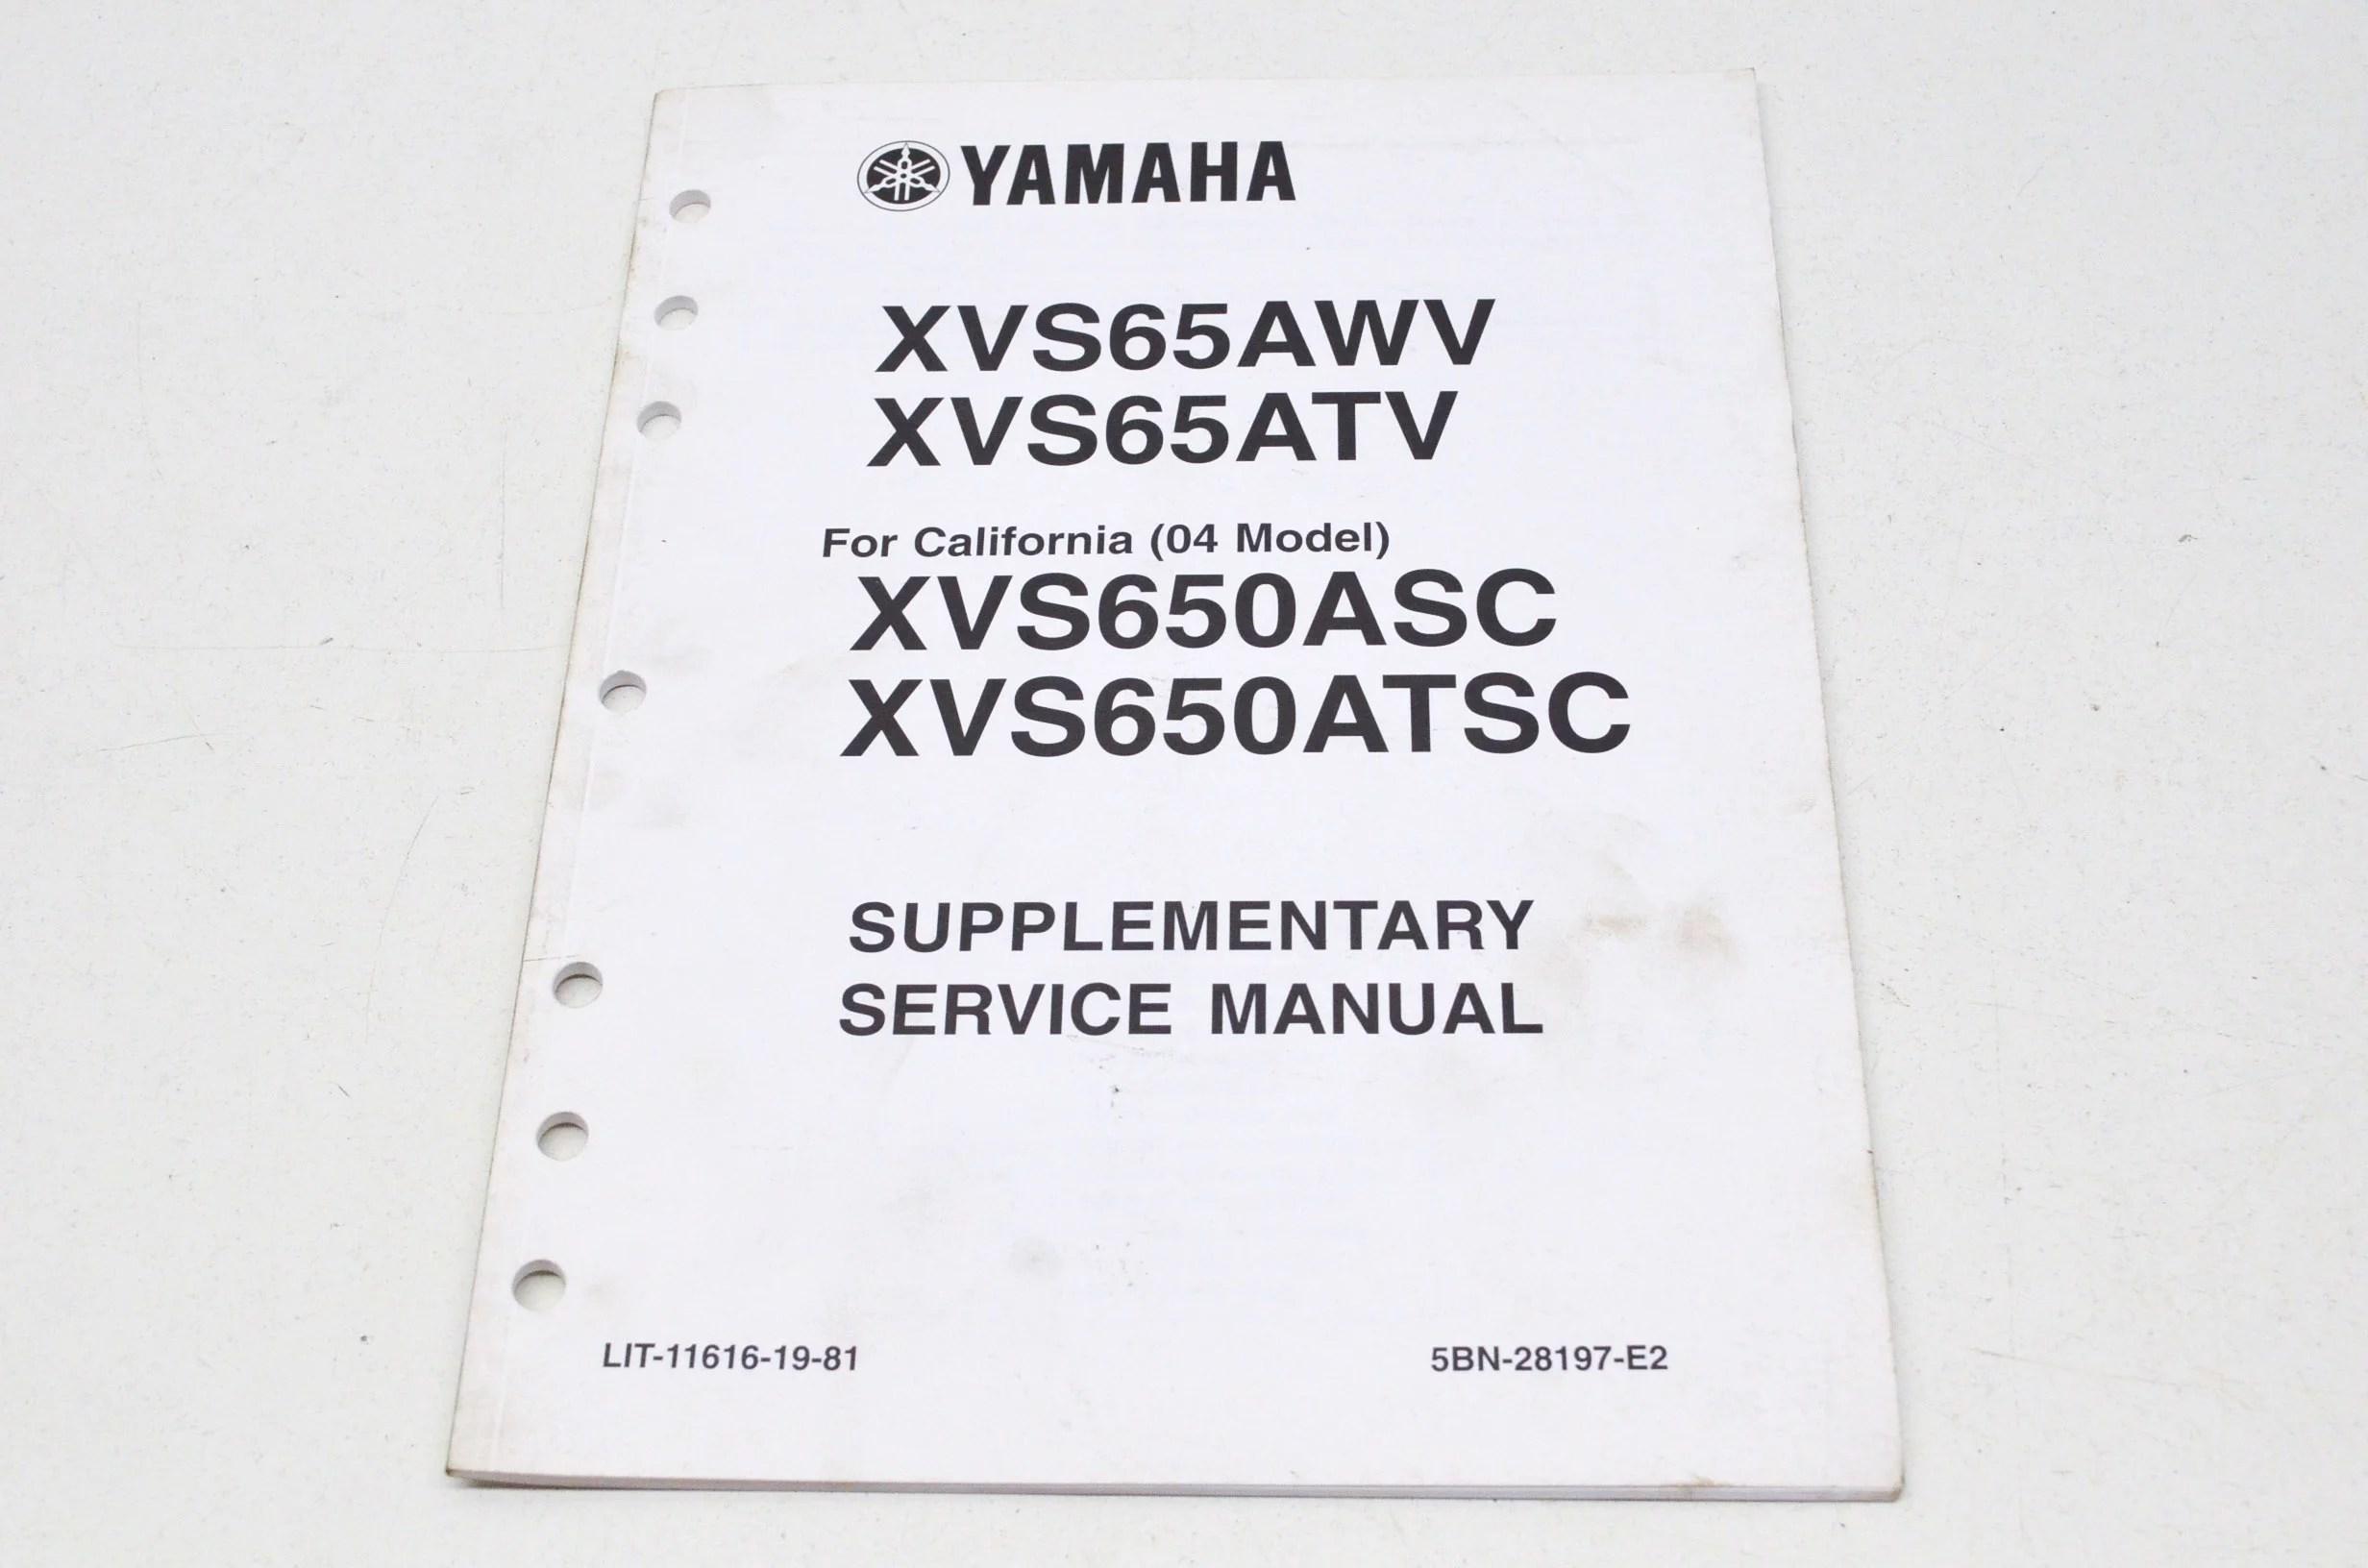 Yamaha LIT-11616-19-81 Supplementary Service Manual